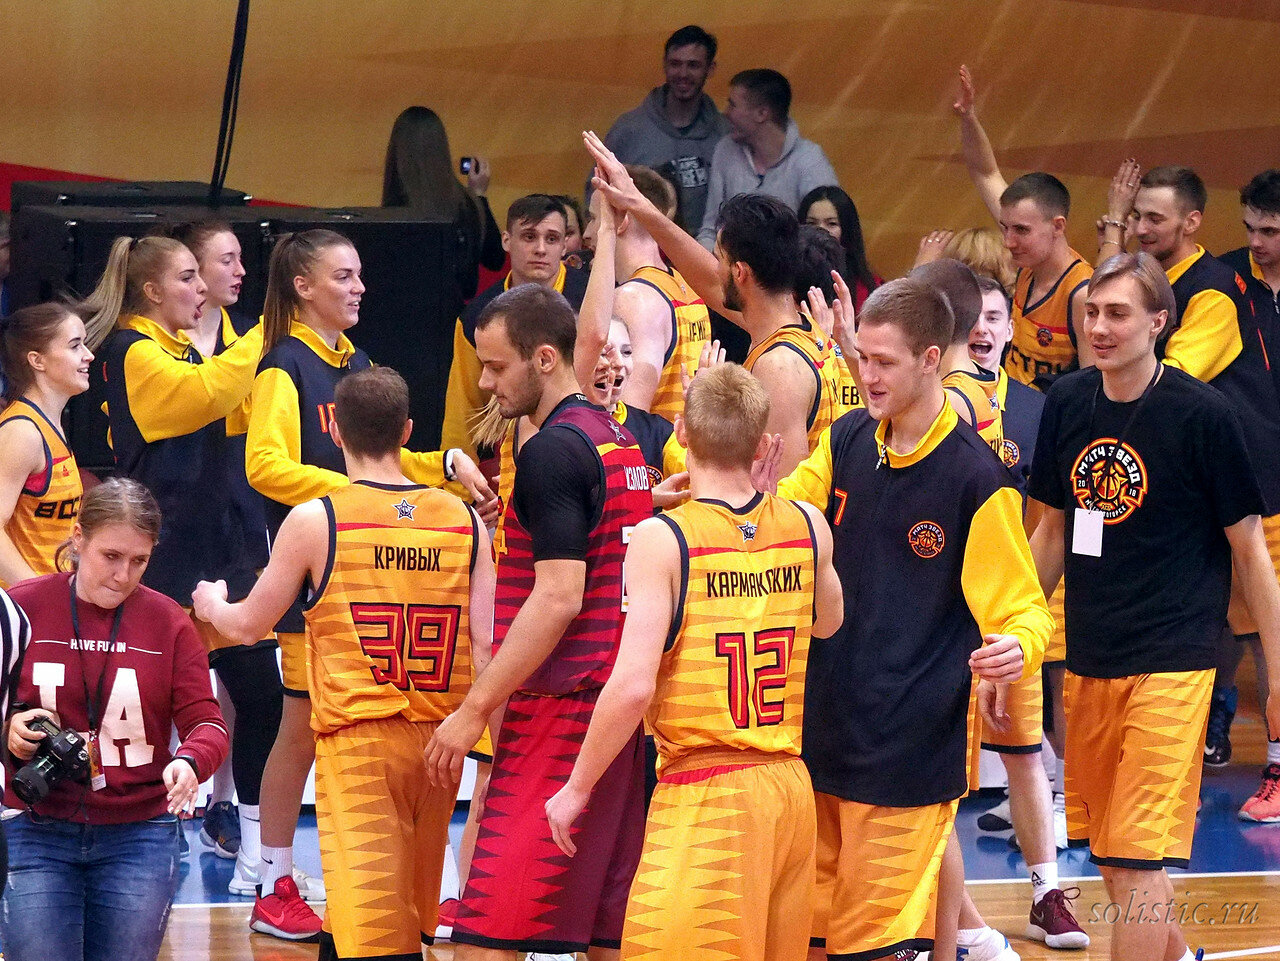 146 Матч звезд АСБ 2018 (ассоциации студенческого баскетбола)